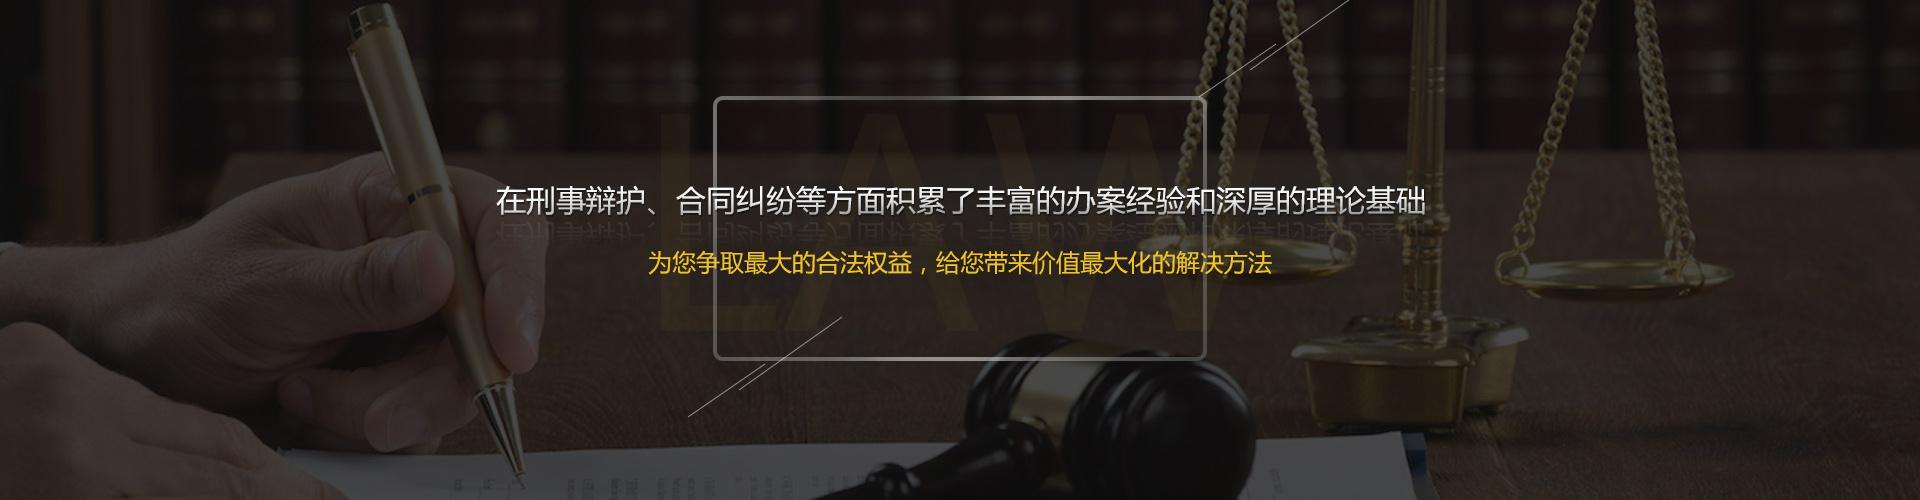 banner大图